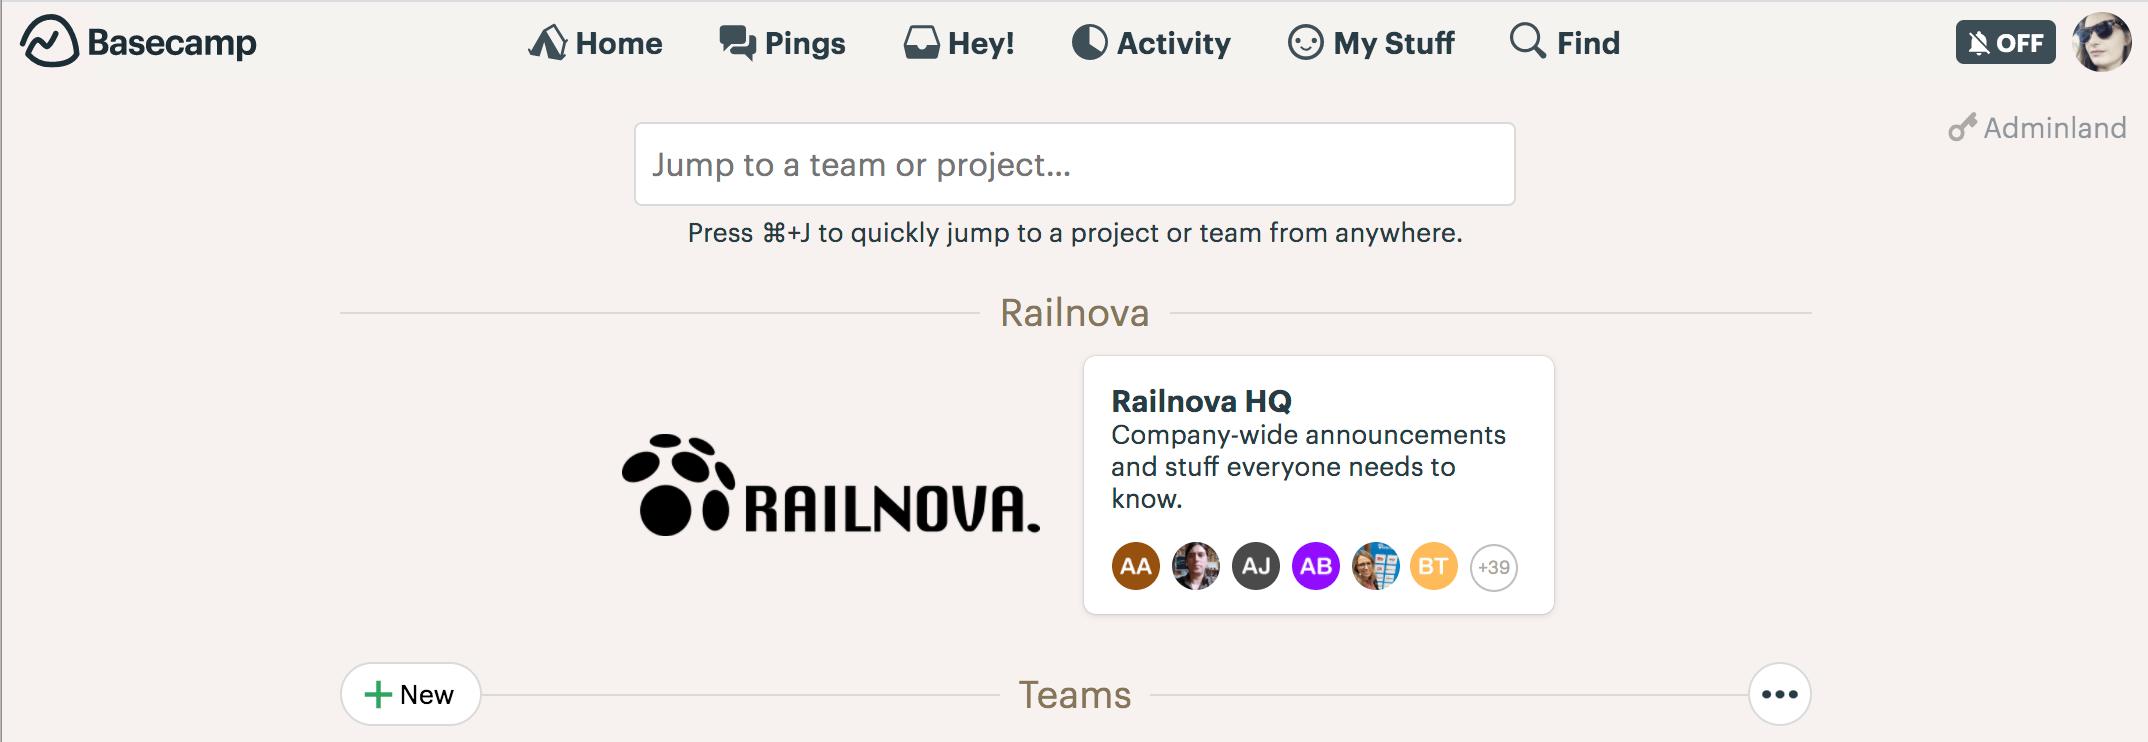 Basecamp is Railnova's communication backbone